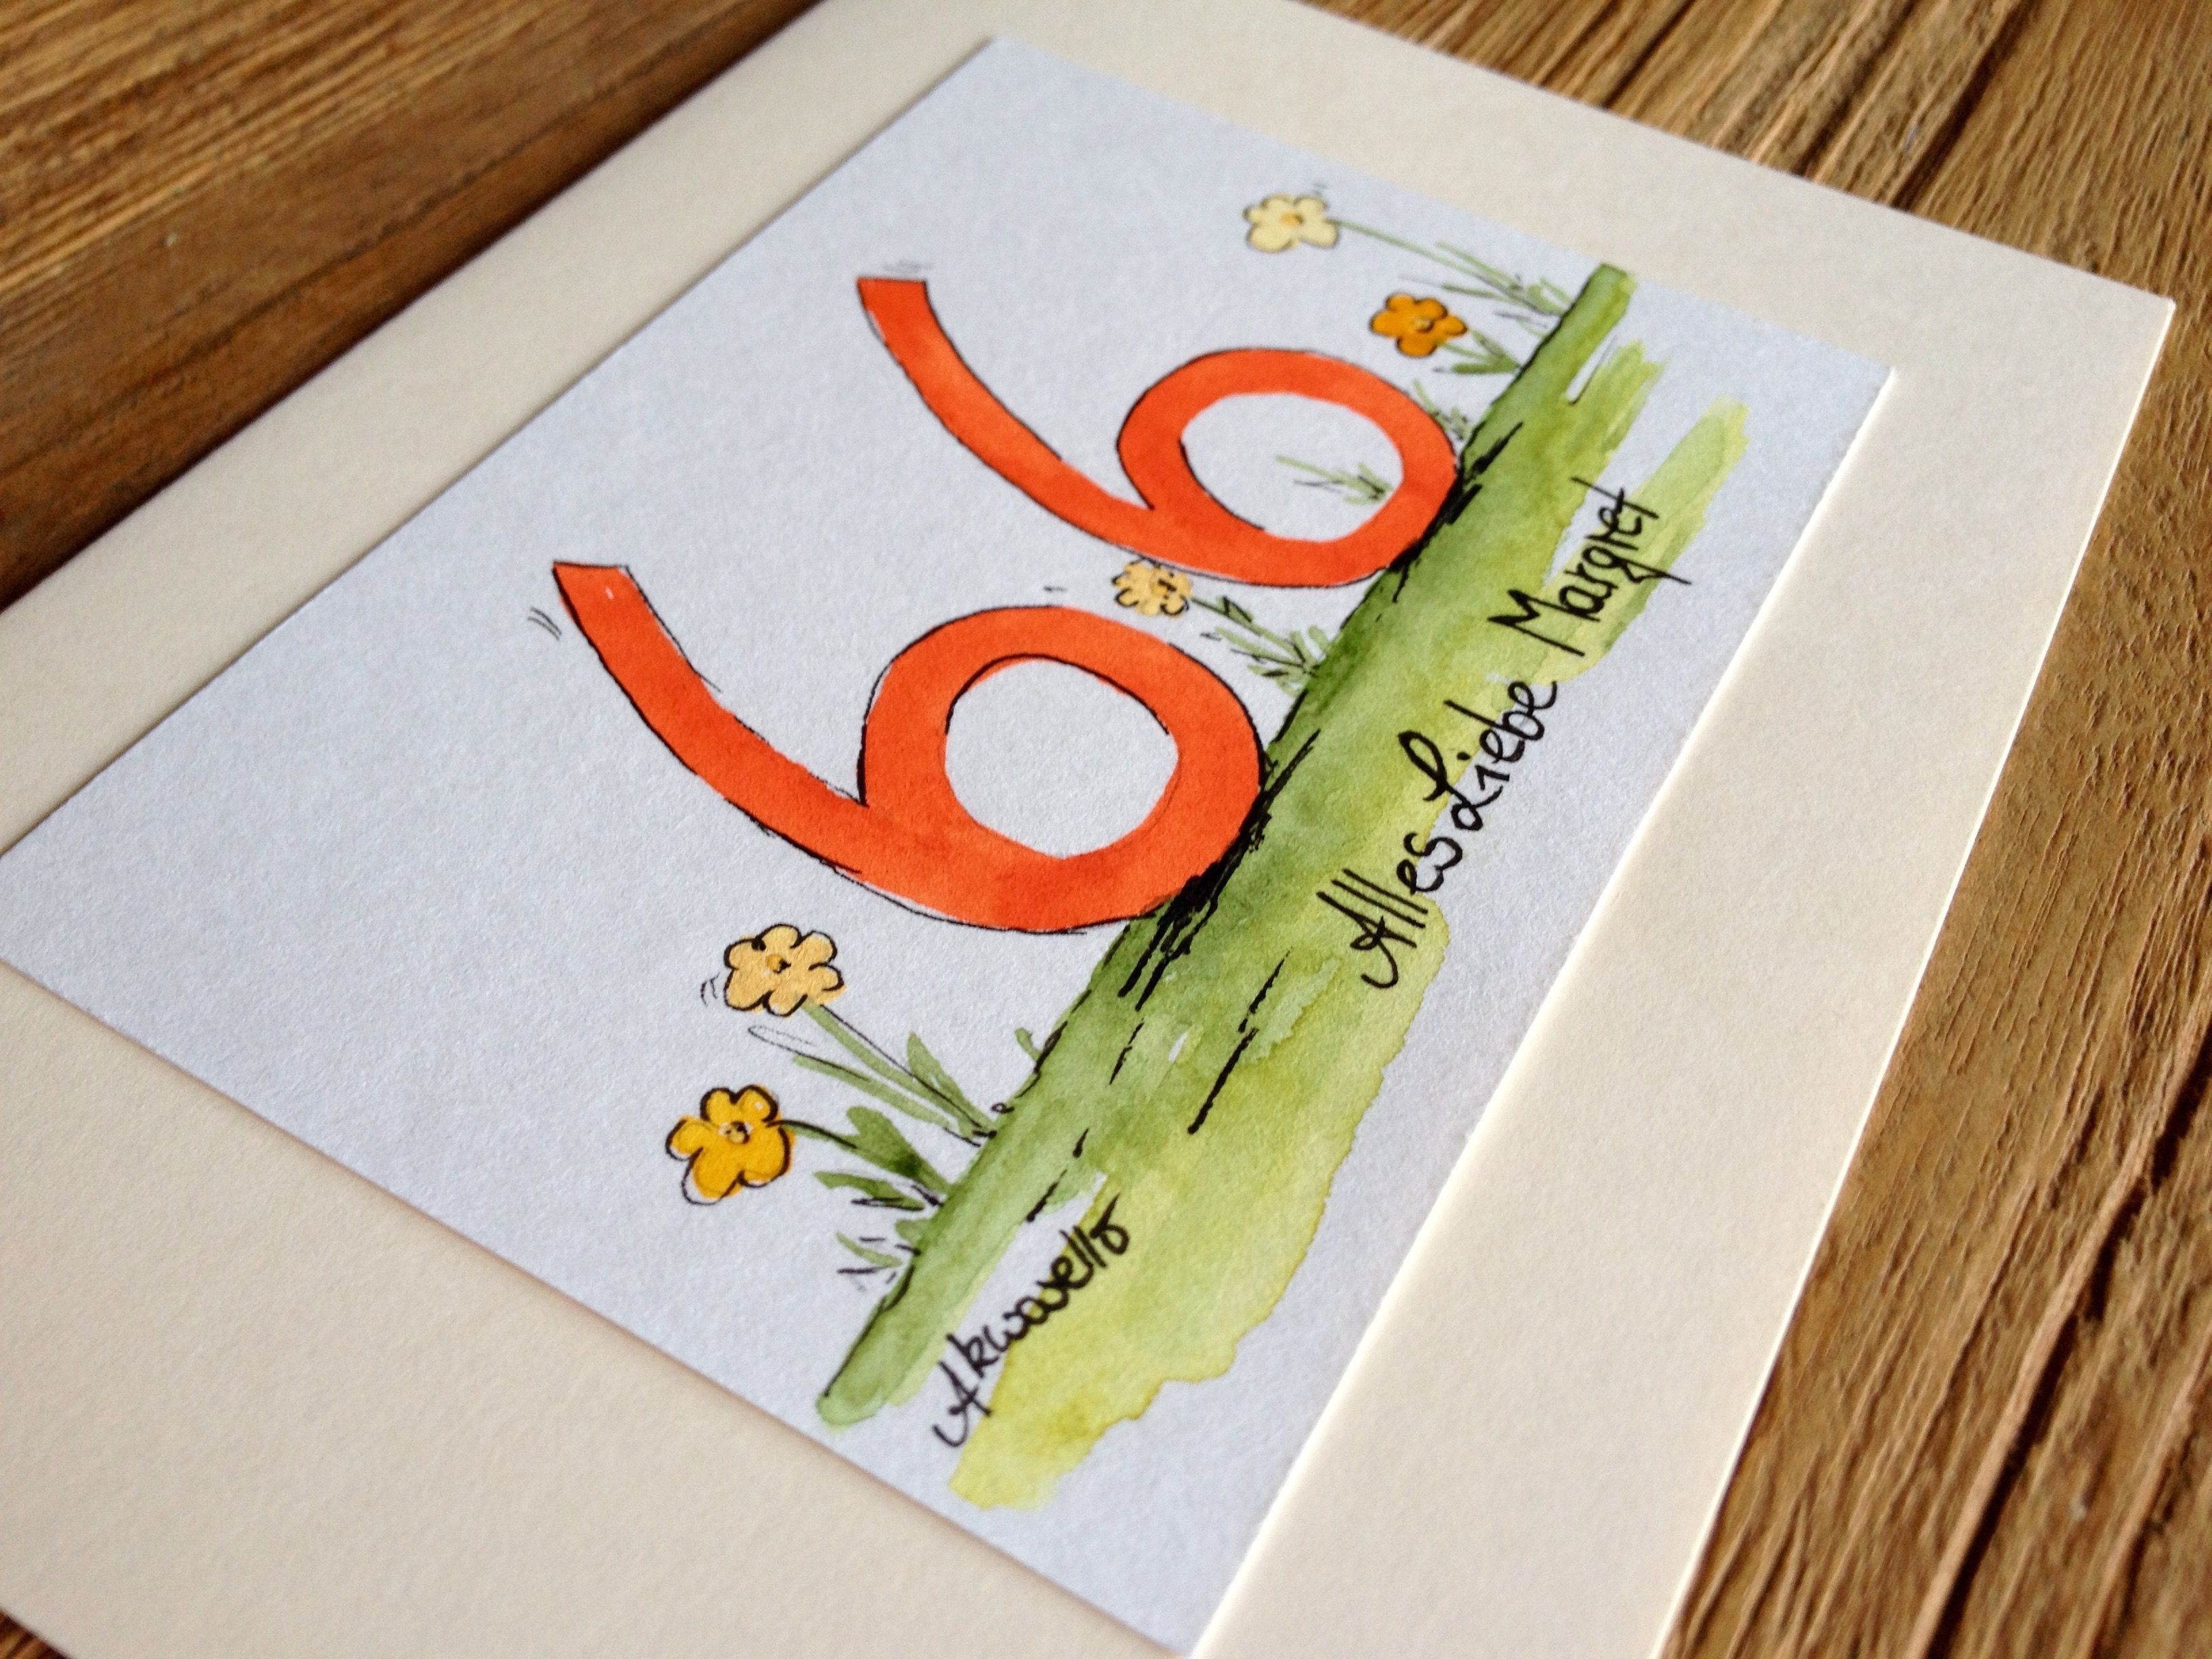 Happy Birthday by Akwarello ** Direkt über den Akwarello-Shop http://de.dawanda.com/shop/Akwarello bestellen! #birthday #Geburtstag#auguri#happy#happybirthday#watercolor#aquarell#glückwünsche#karte#cards#crafting#craft